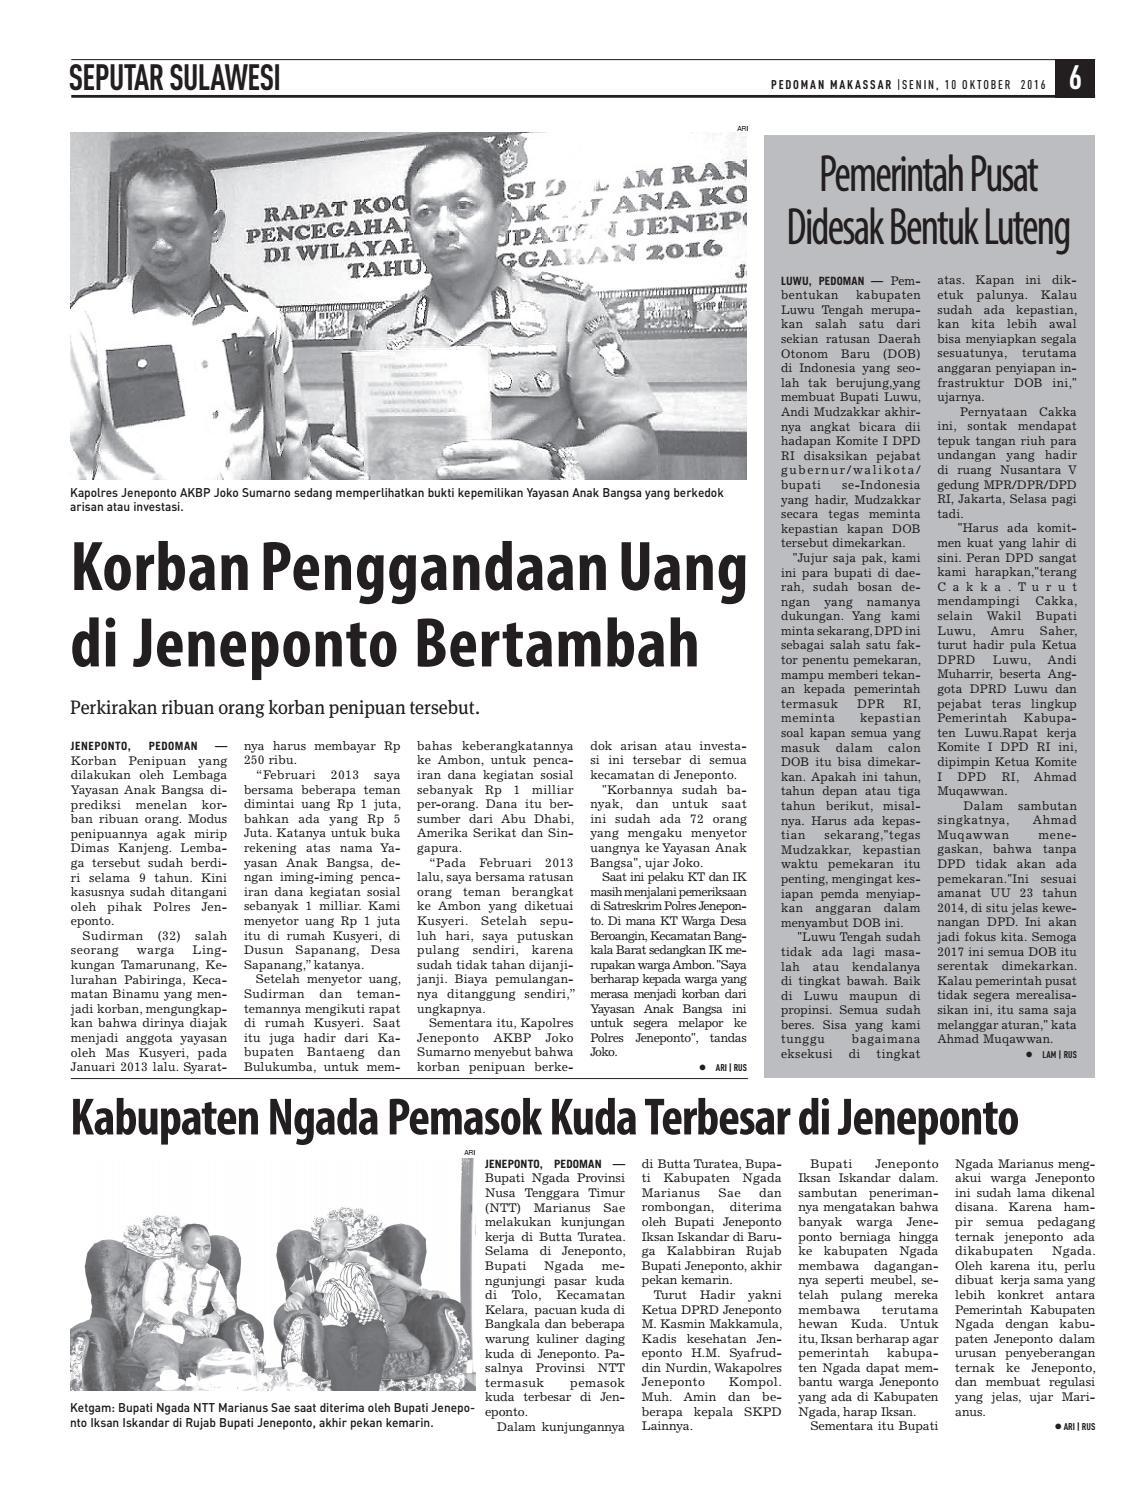 Edisi 67 10 Oktober 2016 Pedoman Makassar By Pedoman Makassar